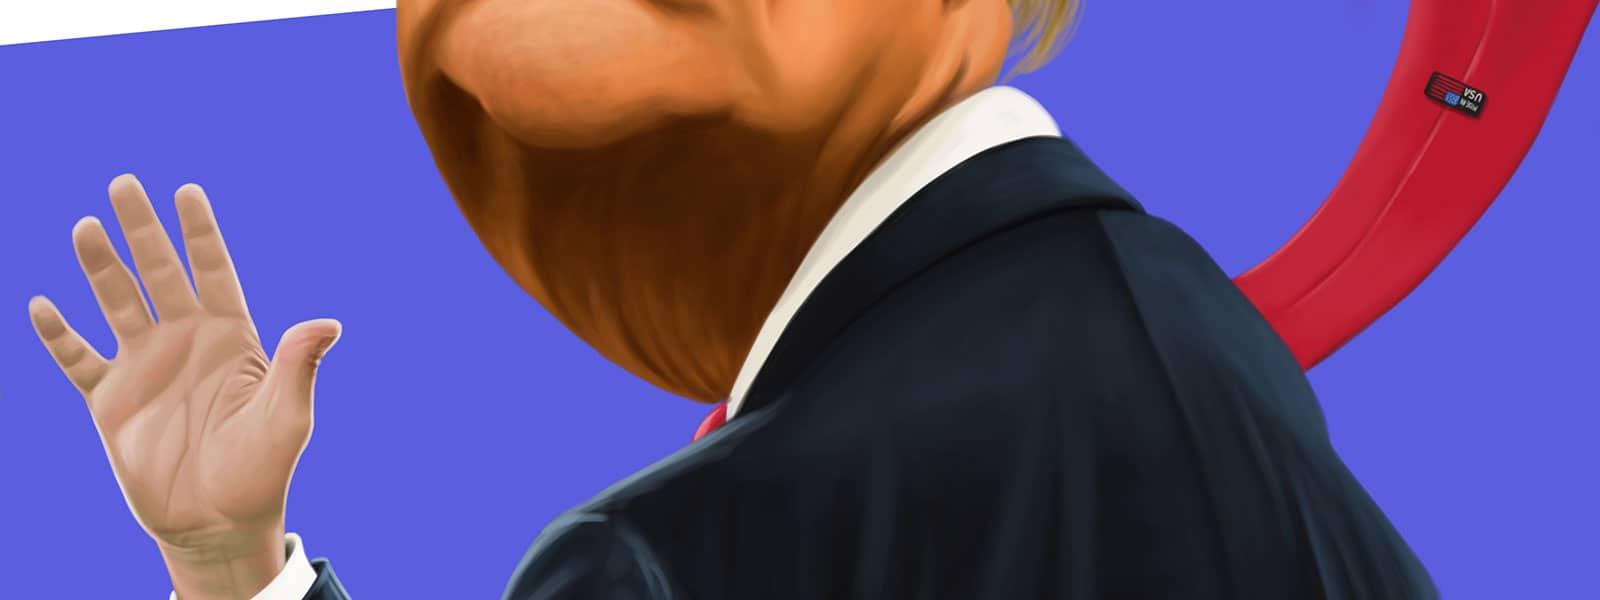 Chin Detail